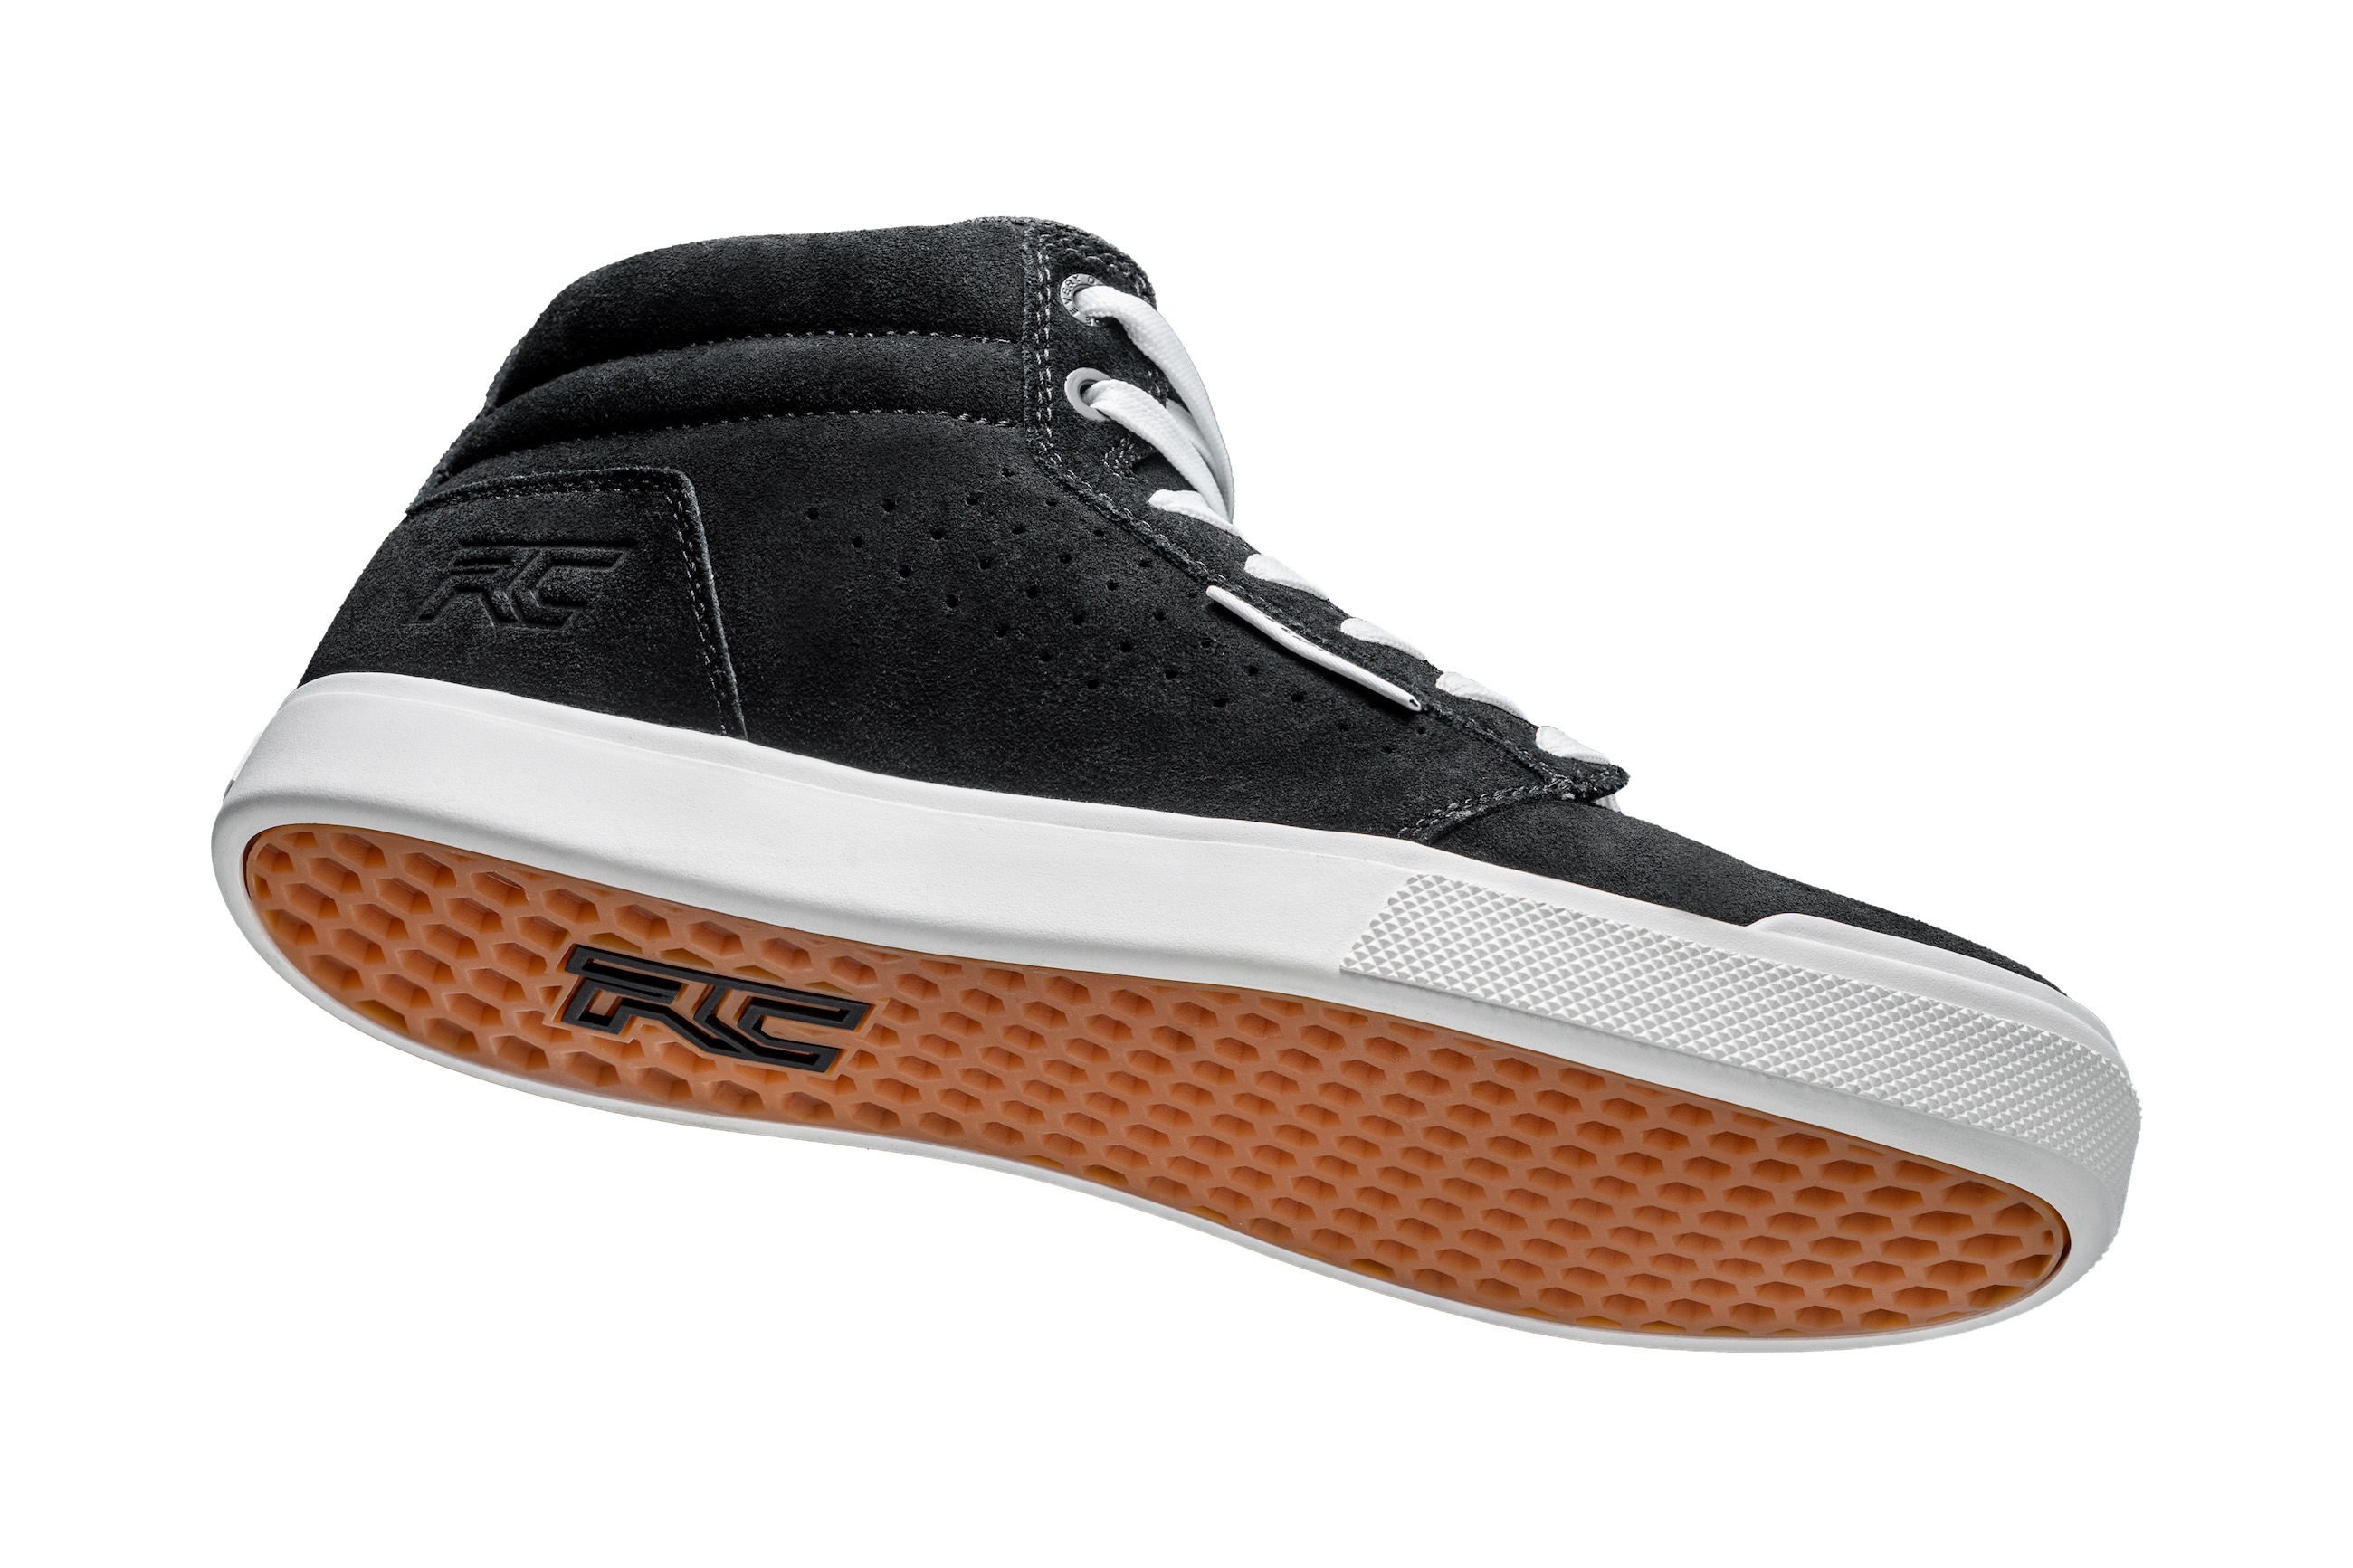 Ride Concepts Vice Mid, Ride Concepts – Vice Mid Shoes